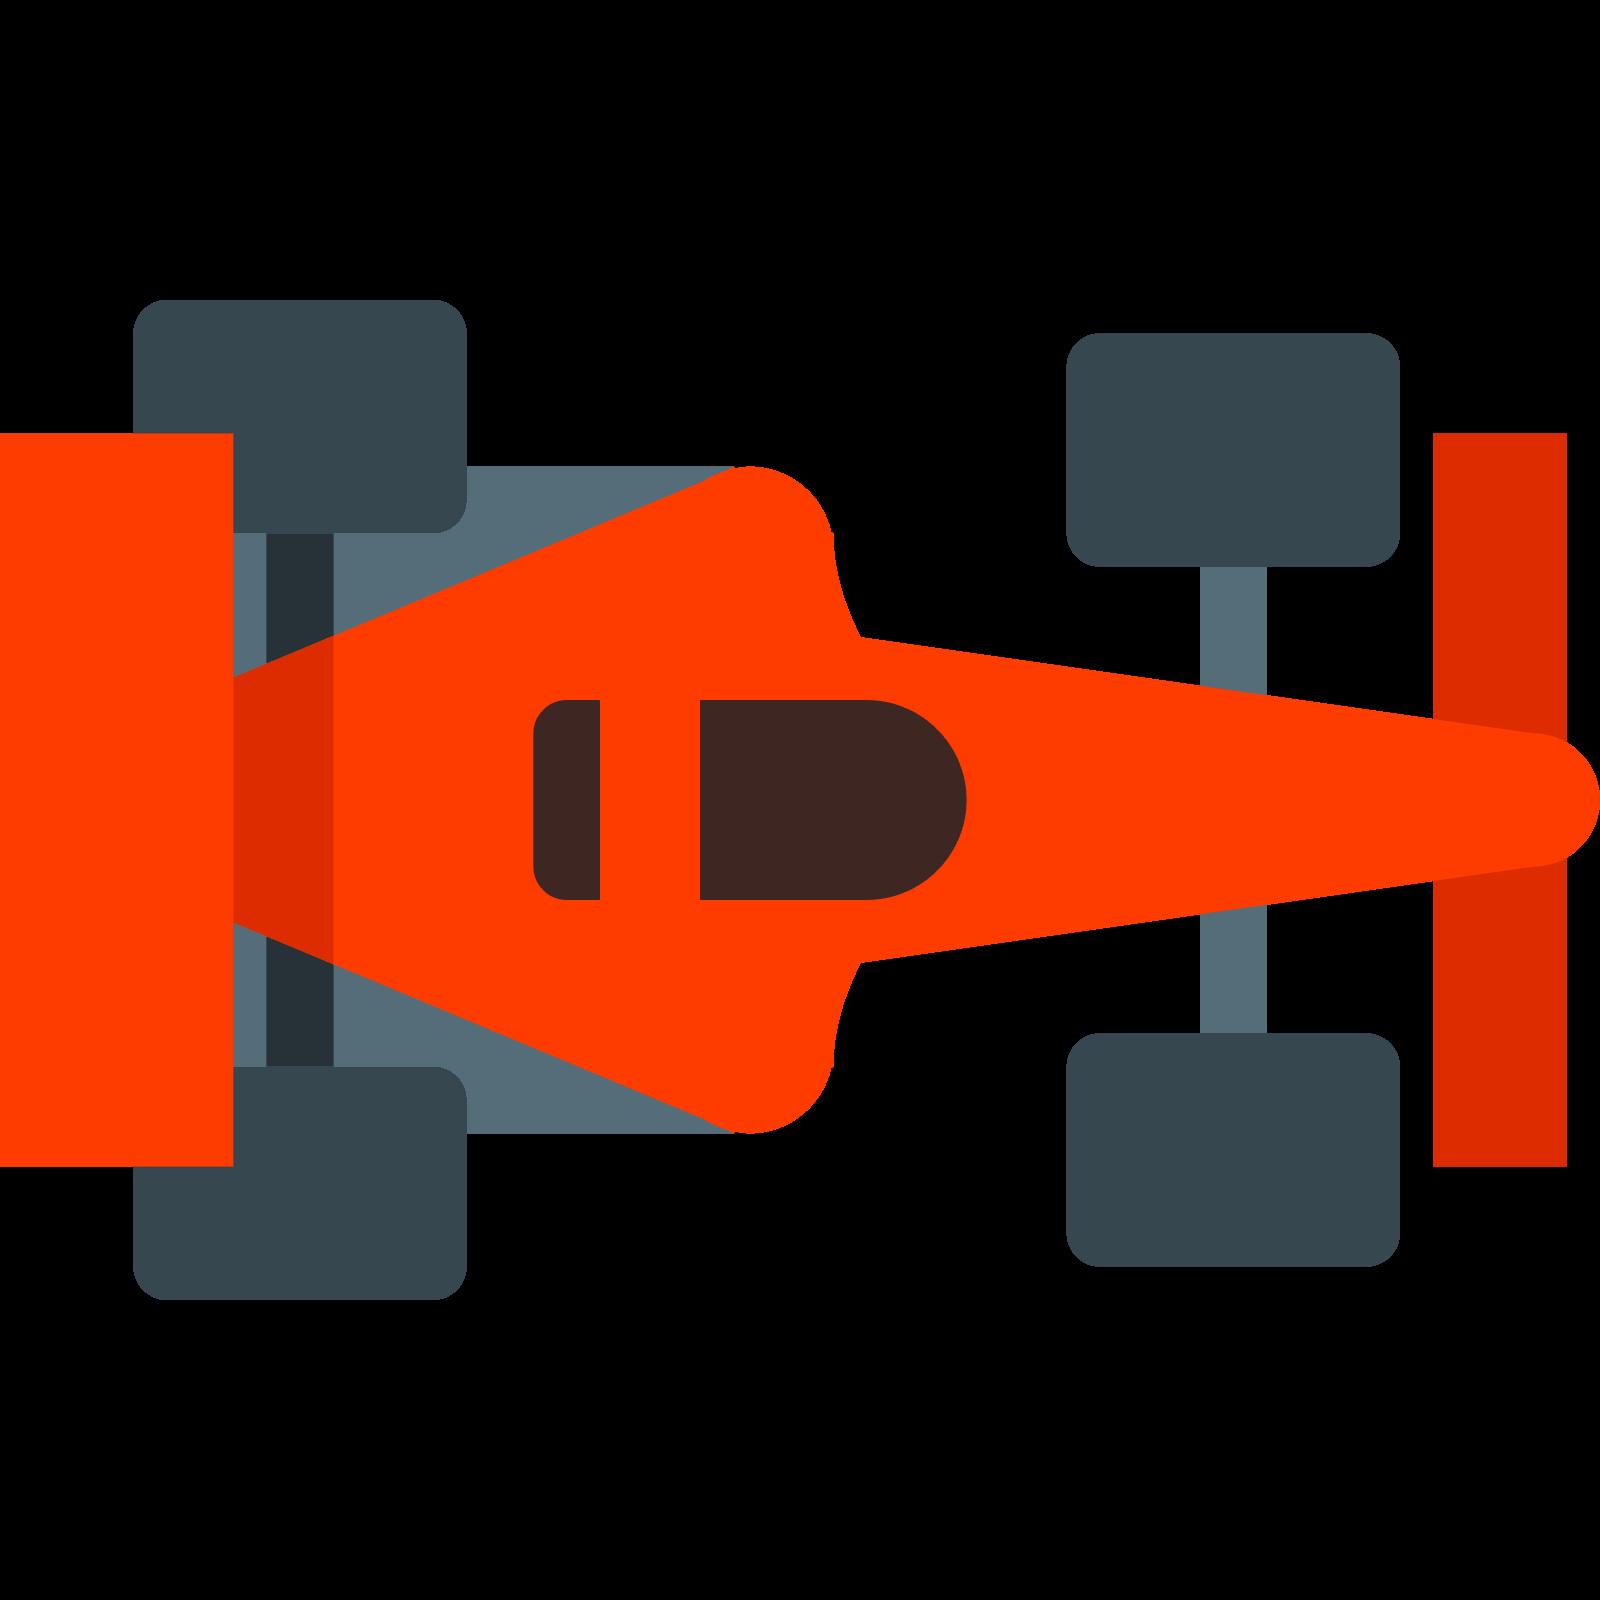 Race above free on. Clipart car orange